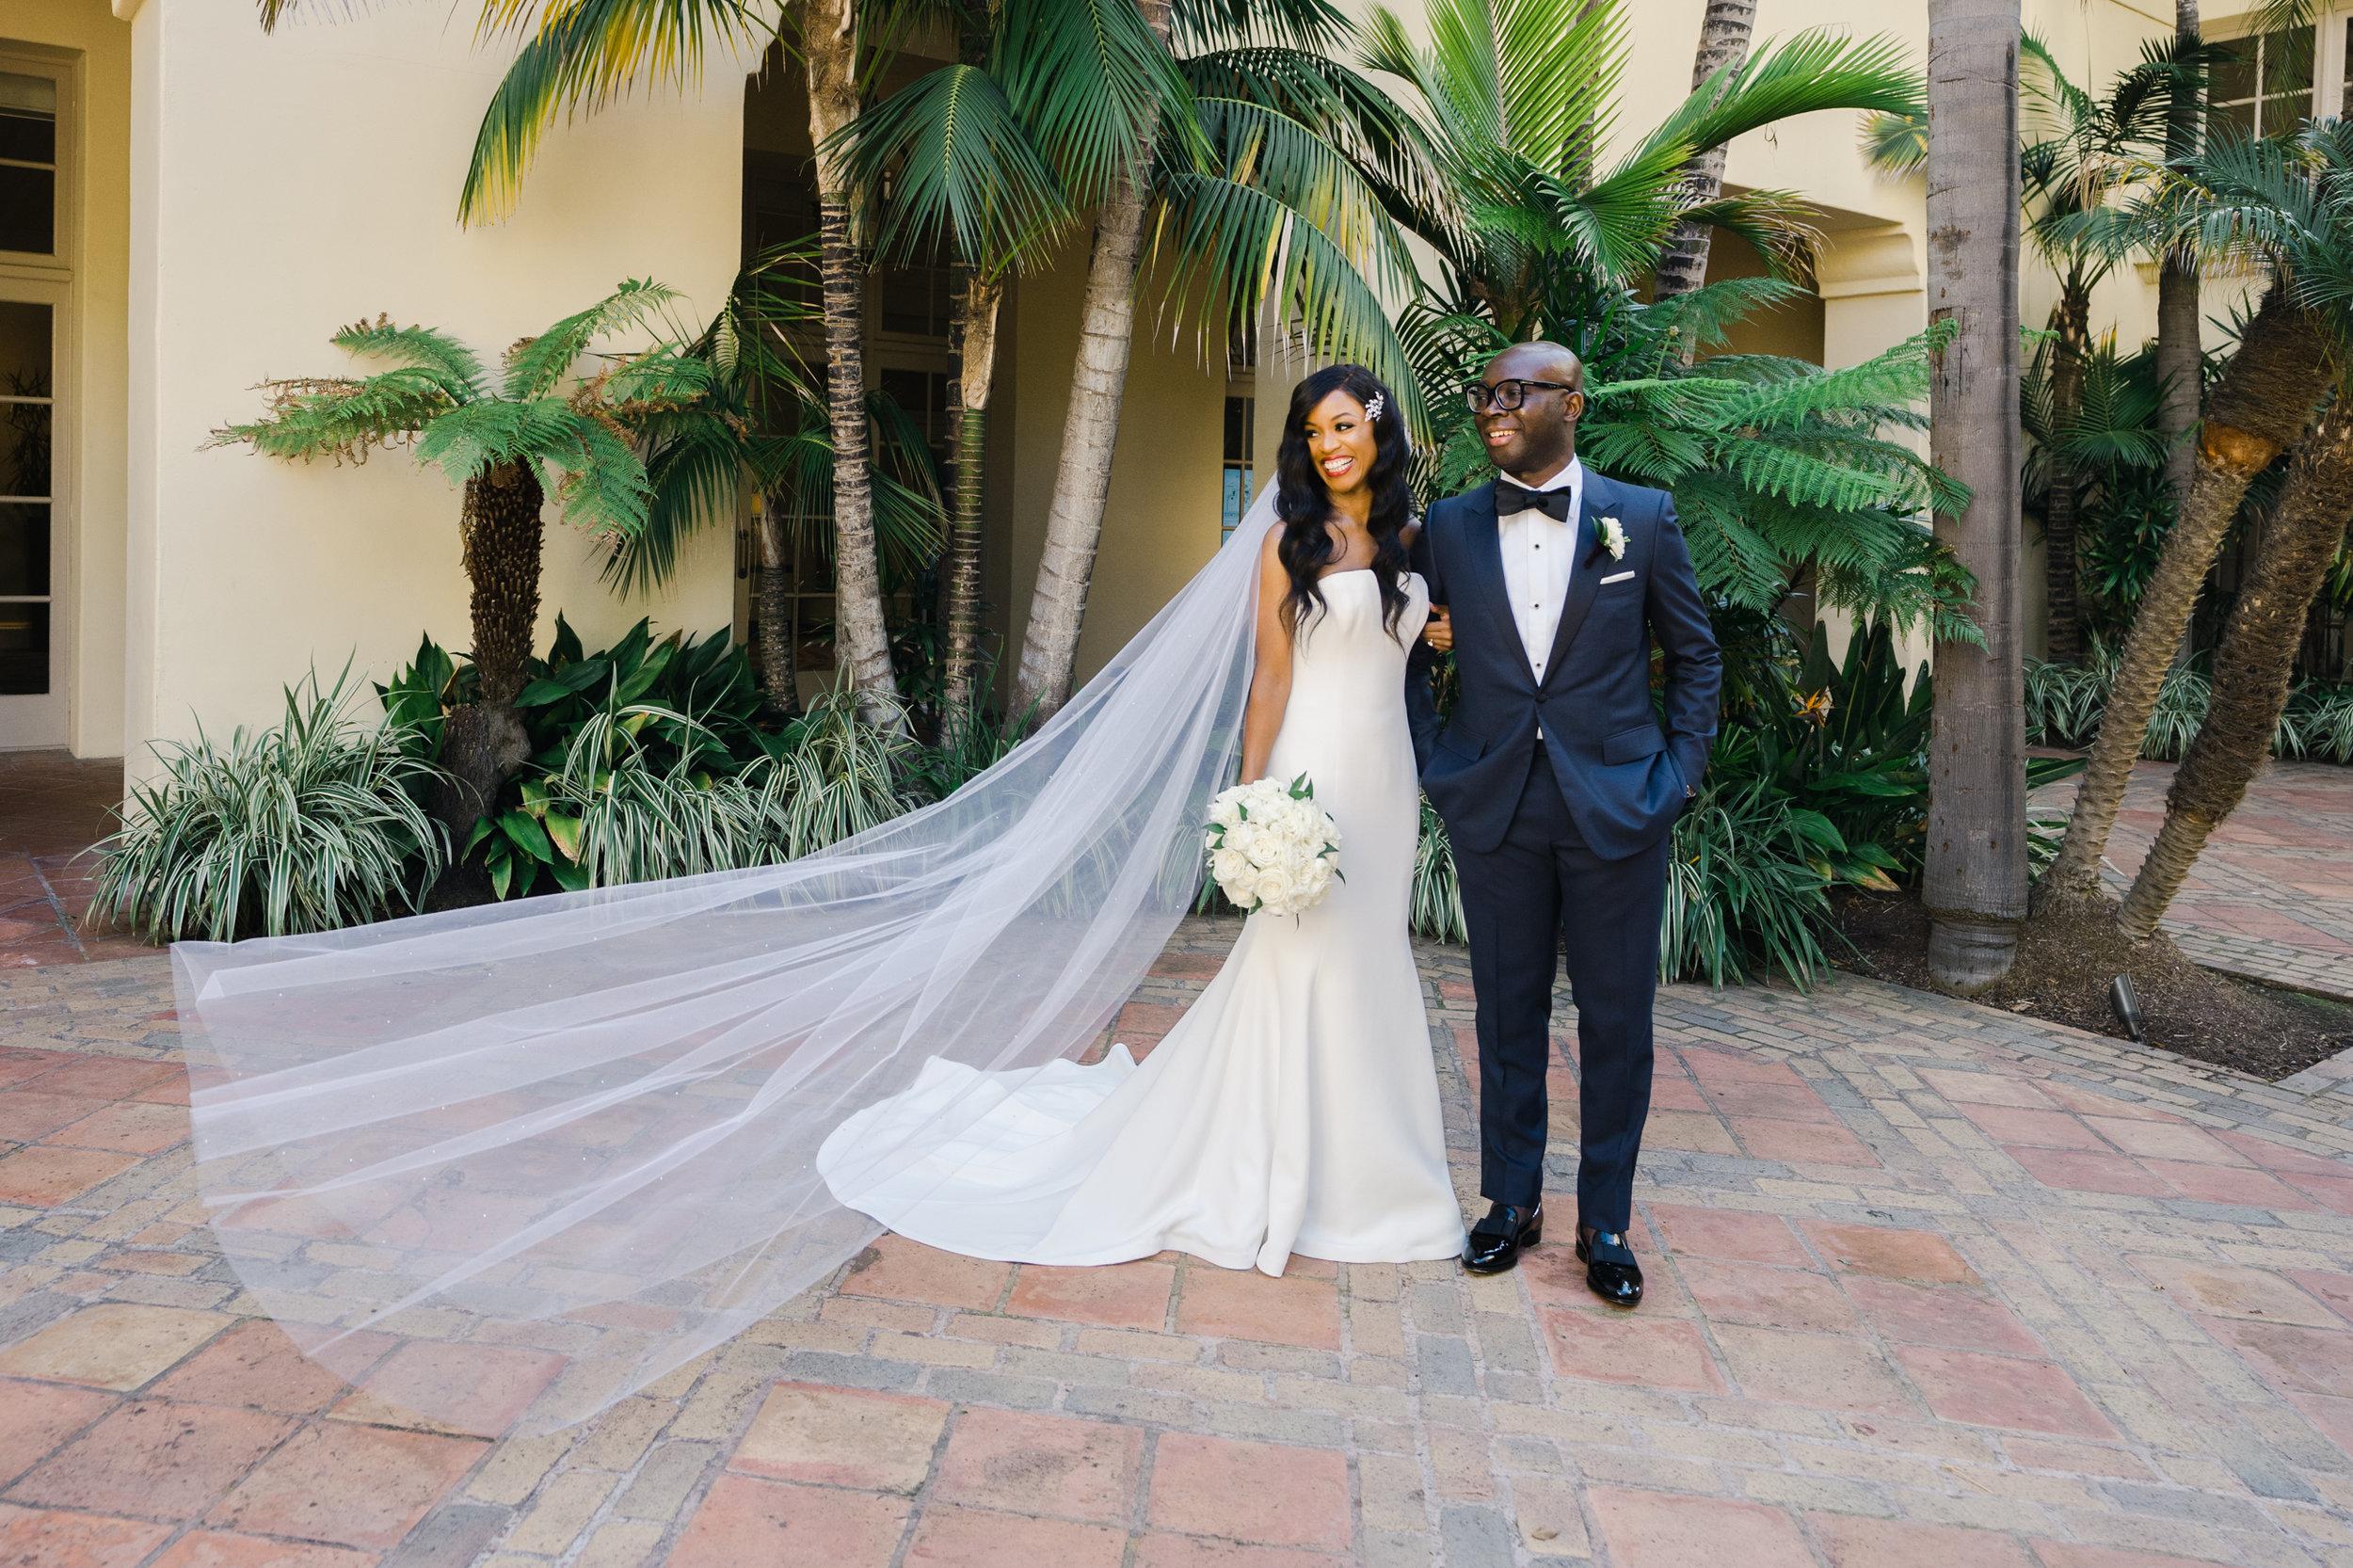 ritz-carlton-laguna-niguel-wedding-sonya_0058.JPG